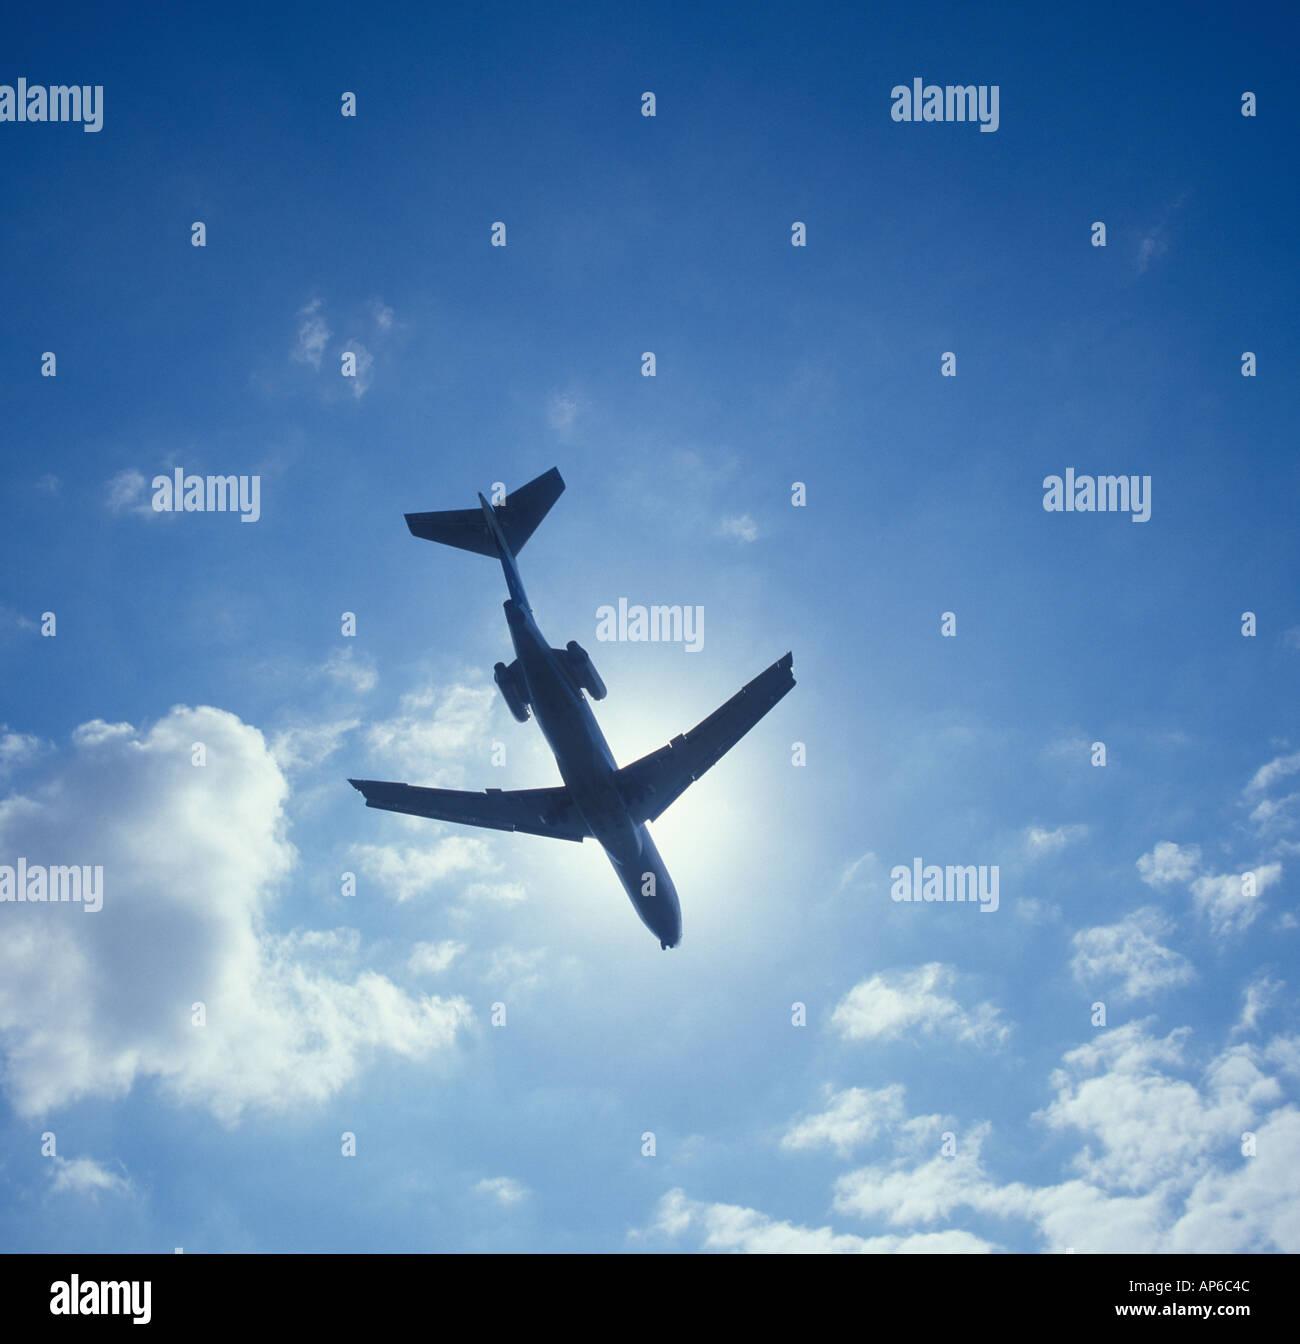 Avión comercial en vuelo Imagen De Stock